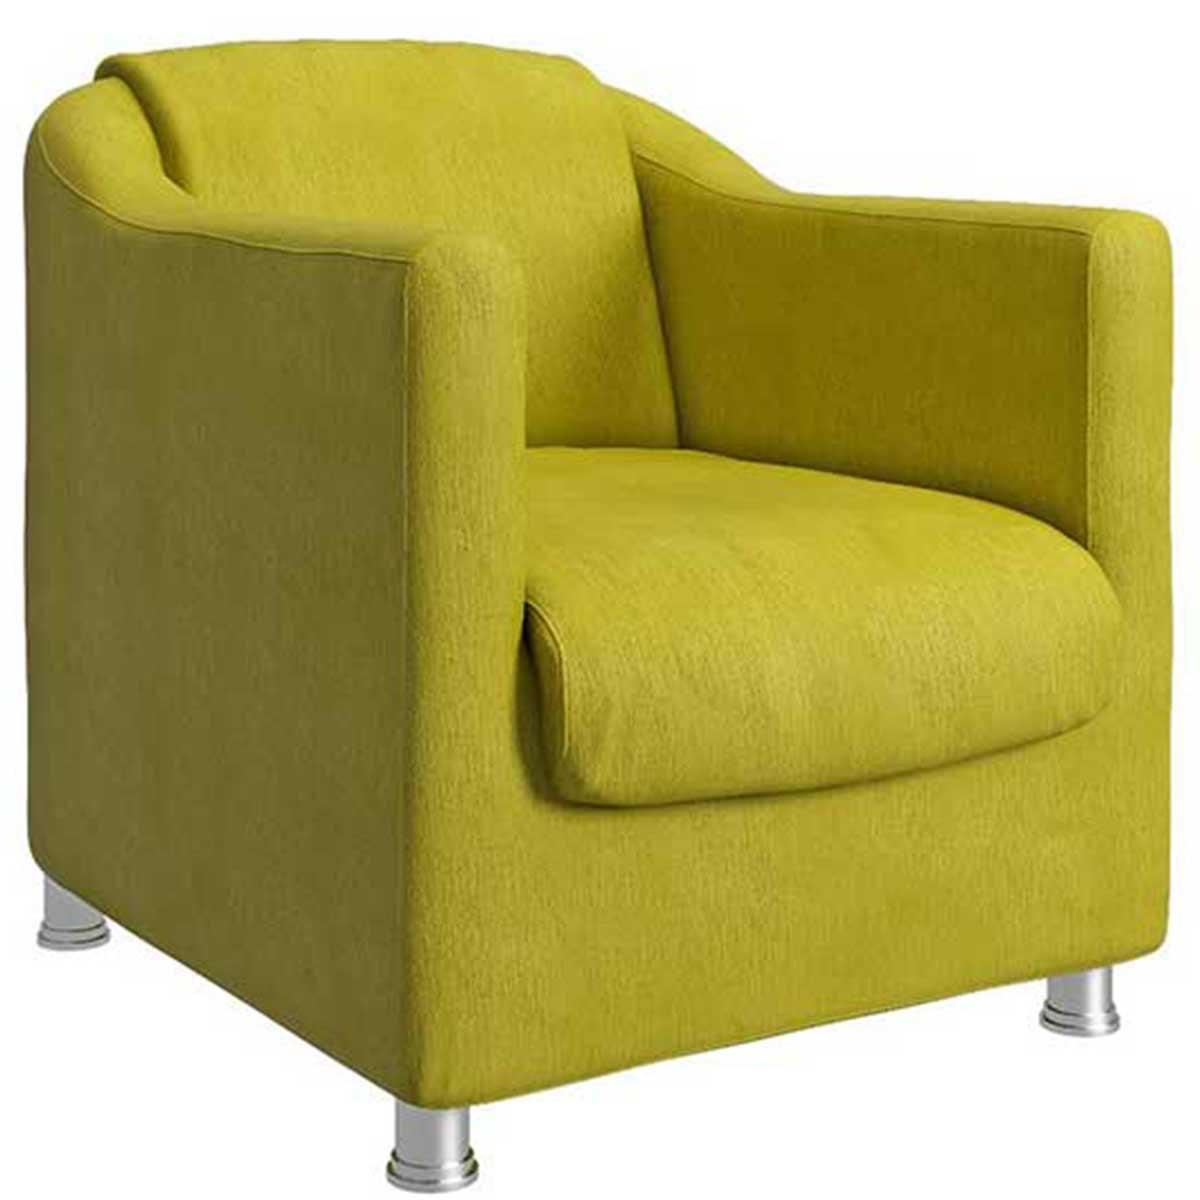 Poltrona Decorativa Luiza Animale Amarelo